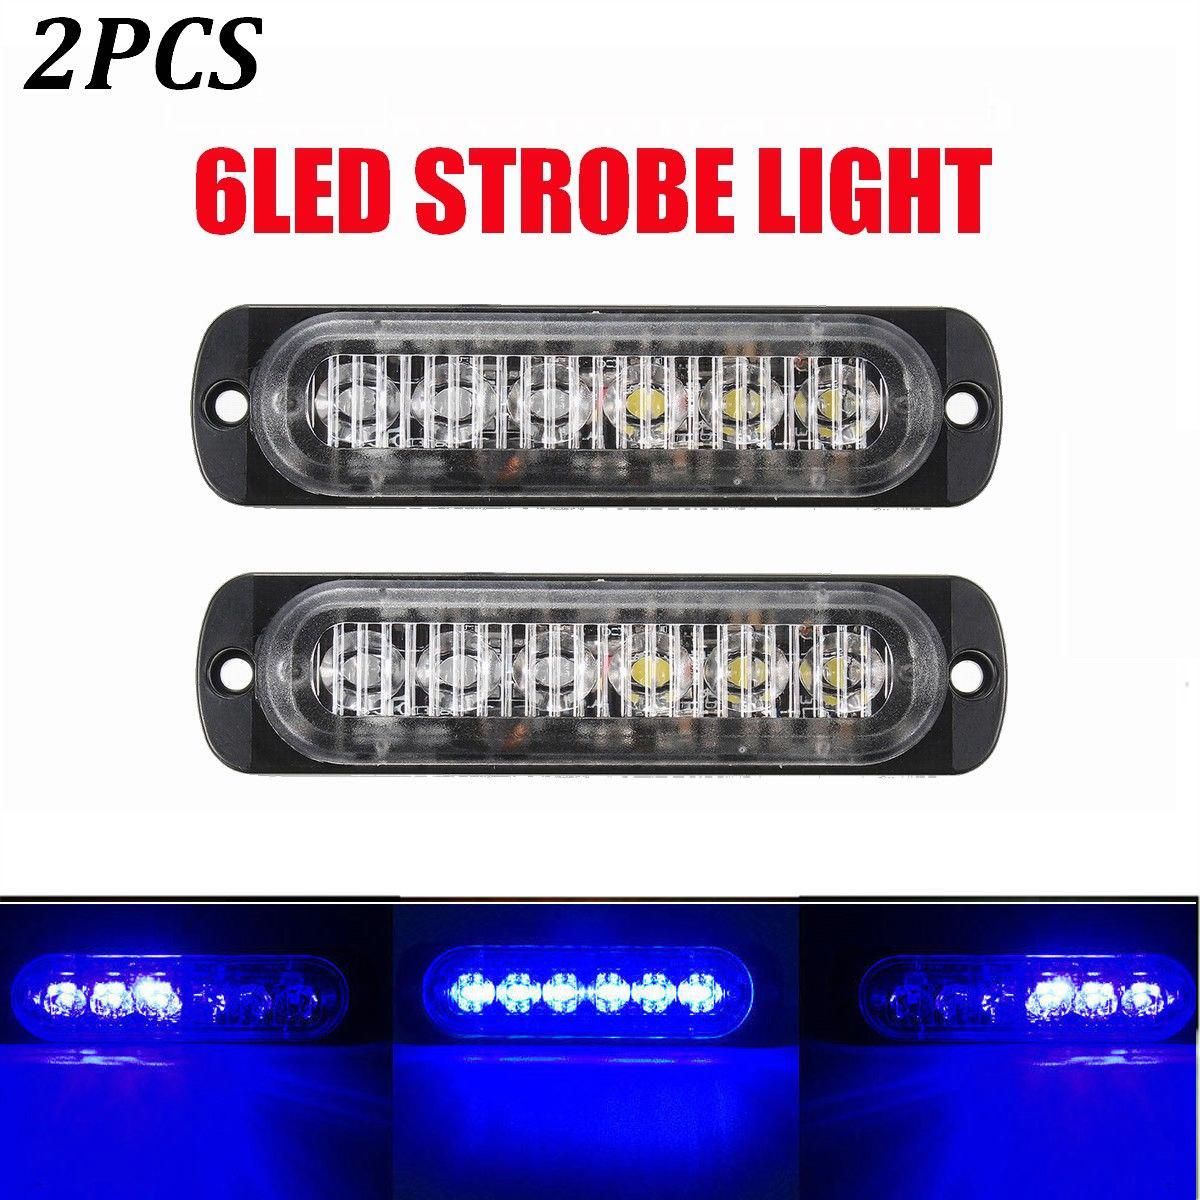 6x 12-24V Car Truck Emergency Beacon Warning Hazard Flash Strobe Light Blue 8LED